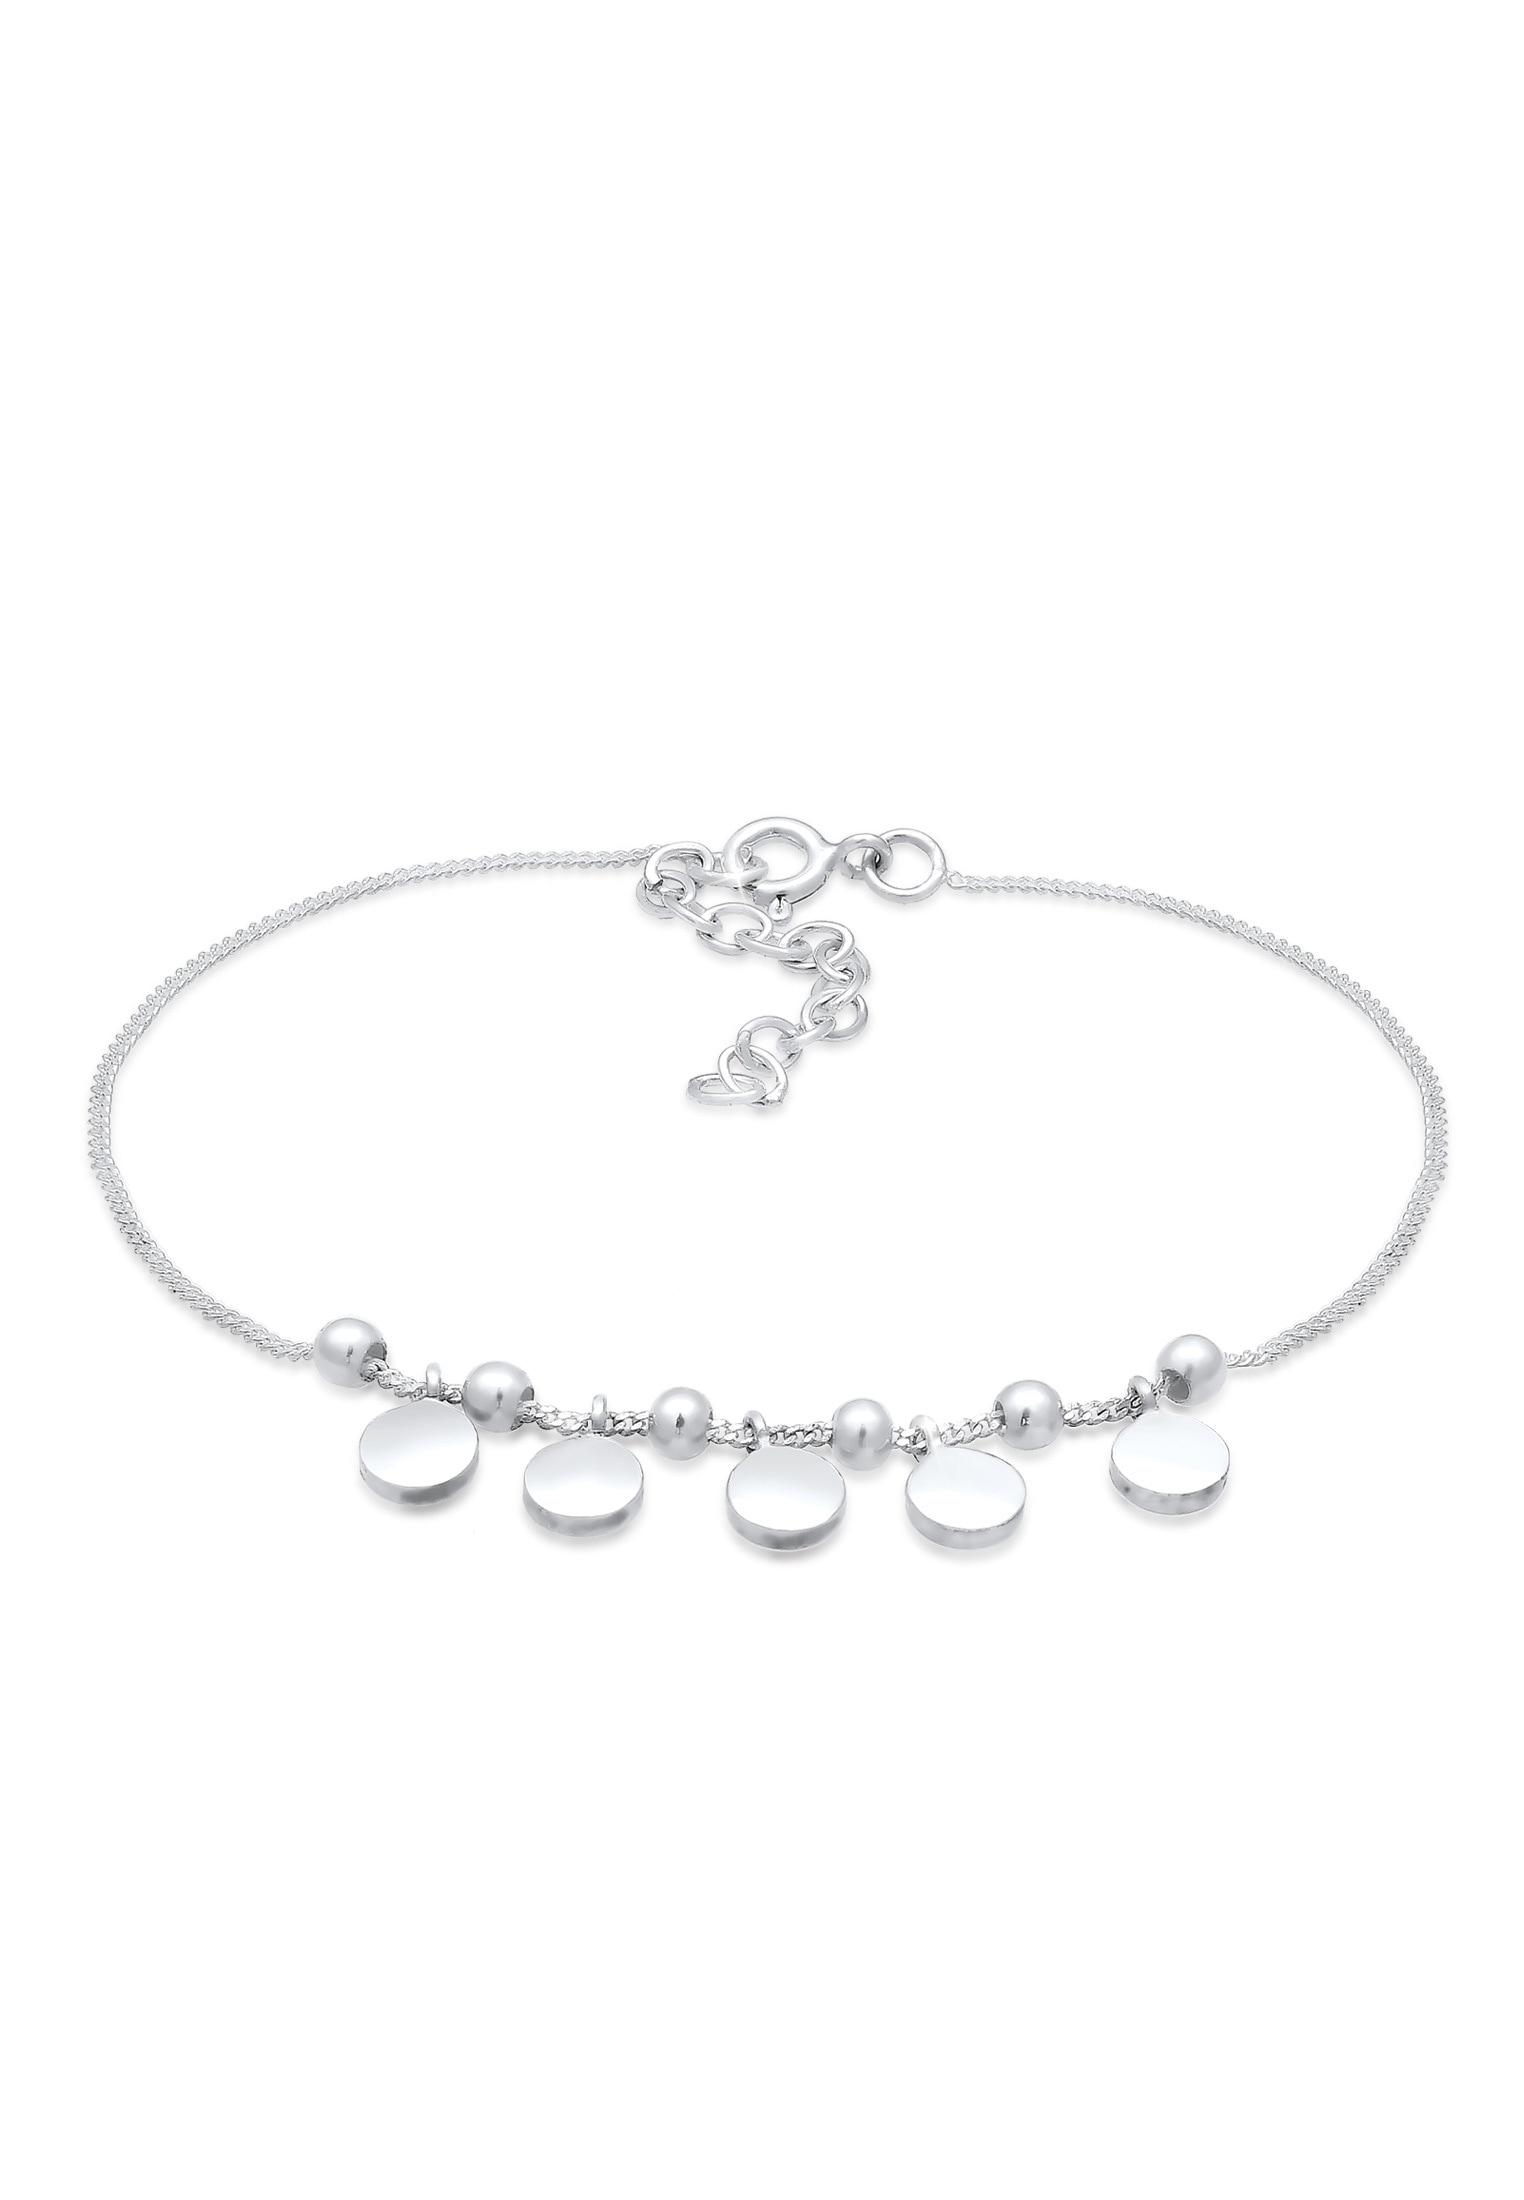 Elli Armband Geo Kugeln Plättchen Trend Cool Modern 925 Silber   Schmuck > Armbänder > Silberarmbänder   Elli